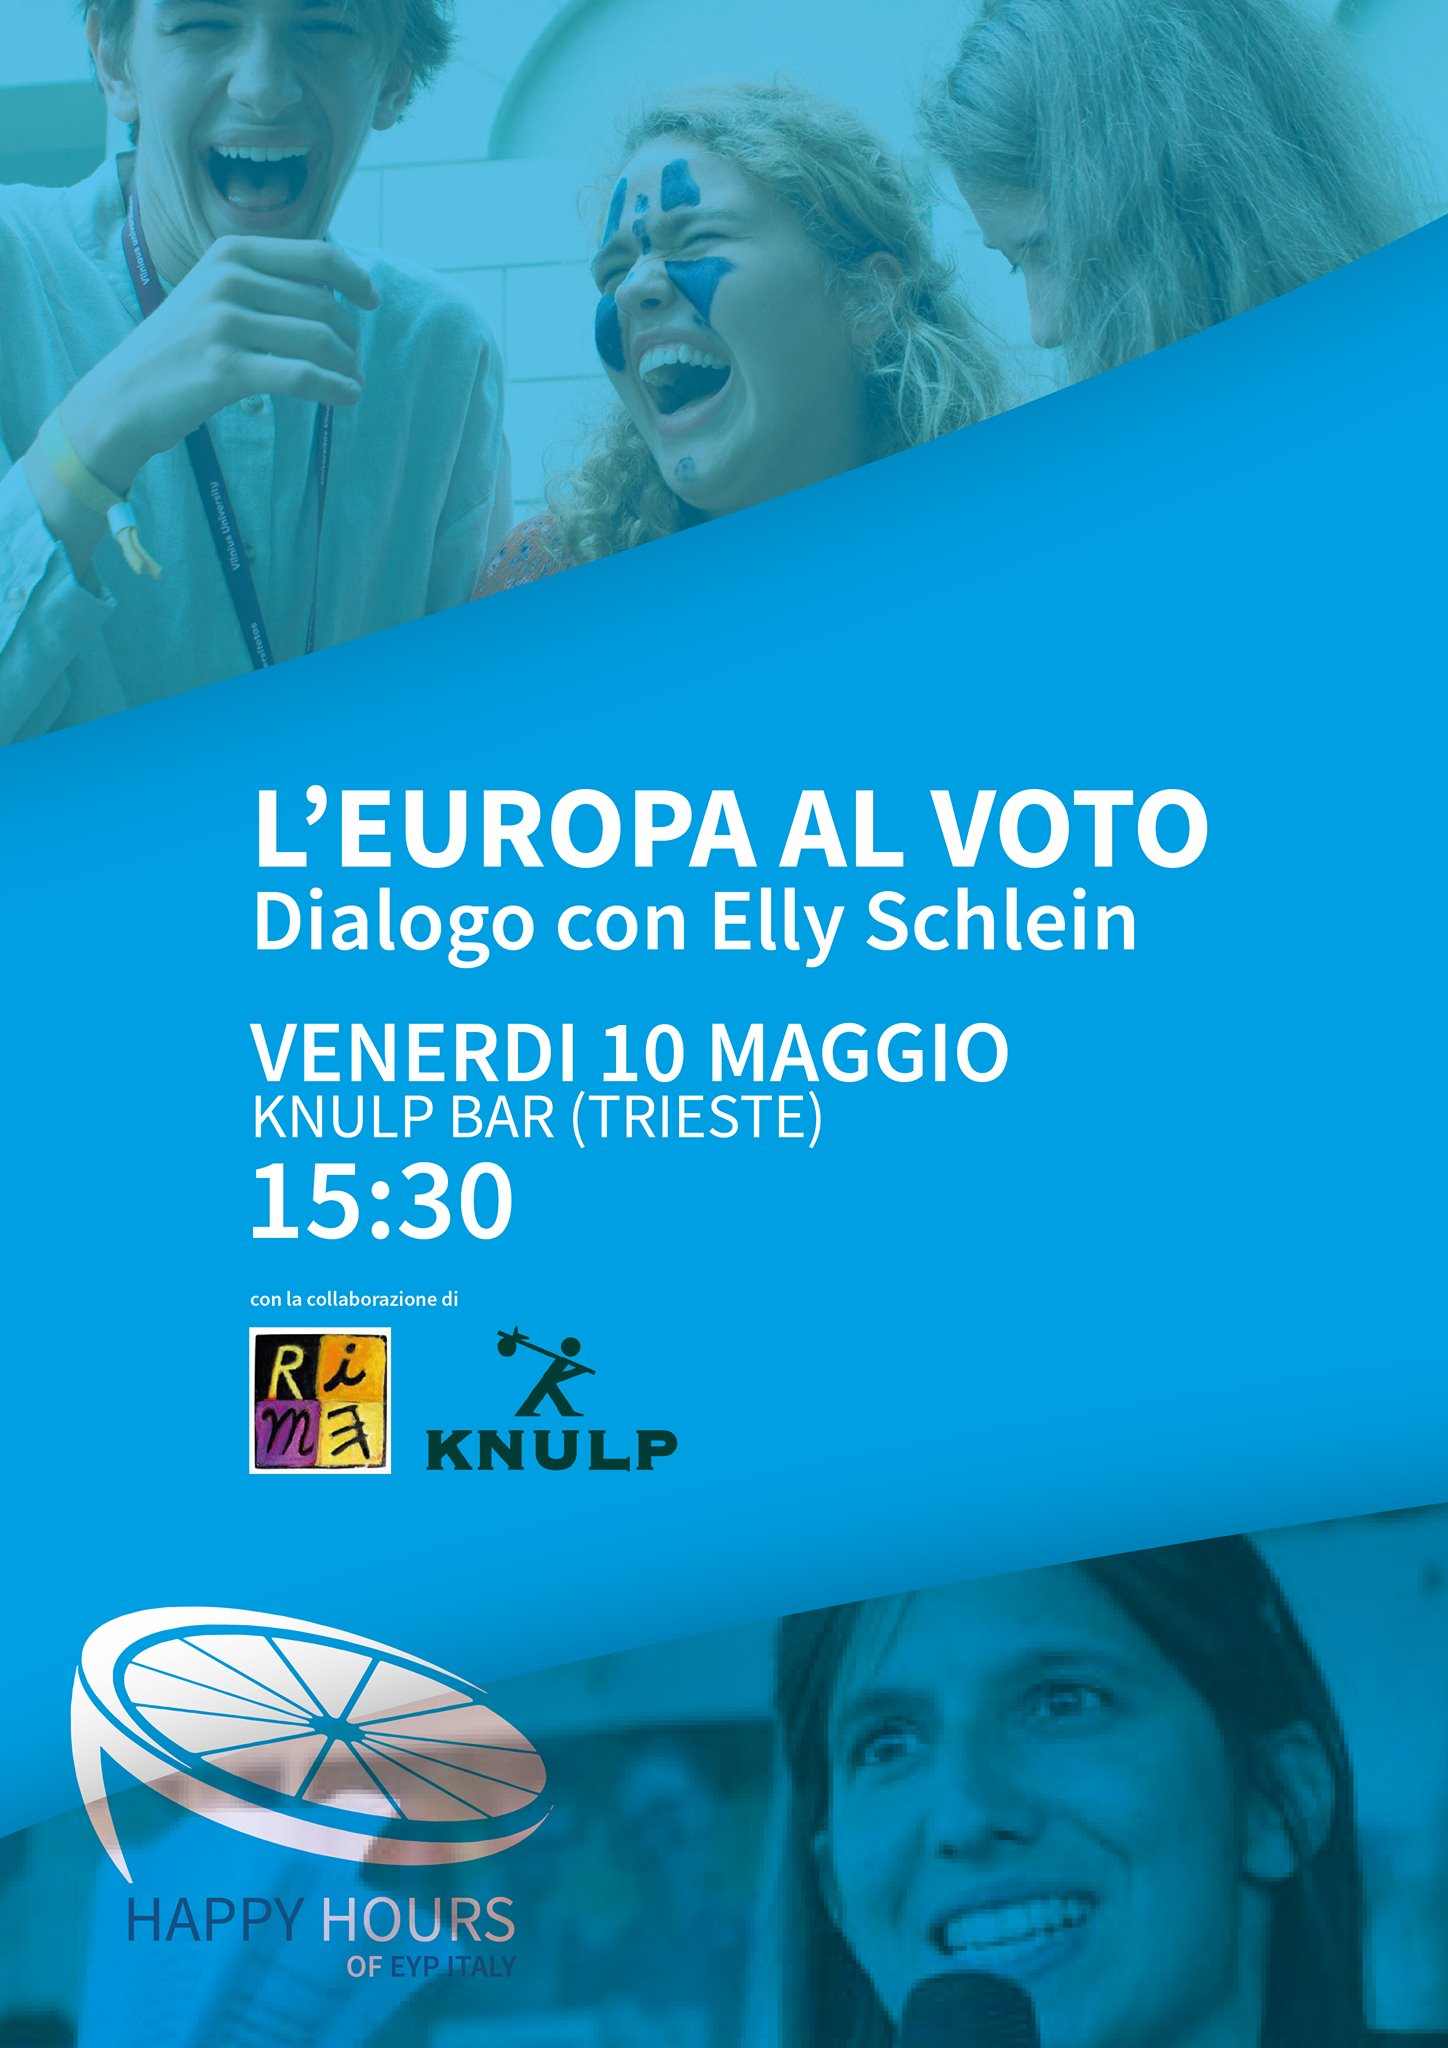 EYP Happy Hour - L'Europa al voto, con Elly Schlein - Trieste